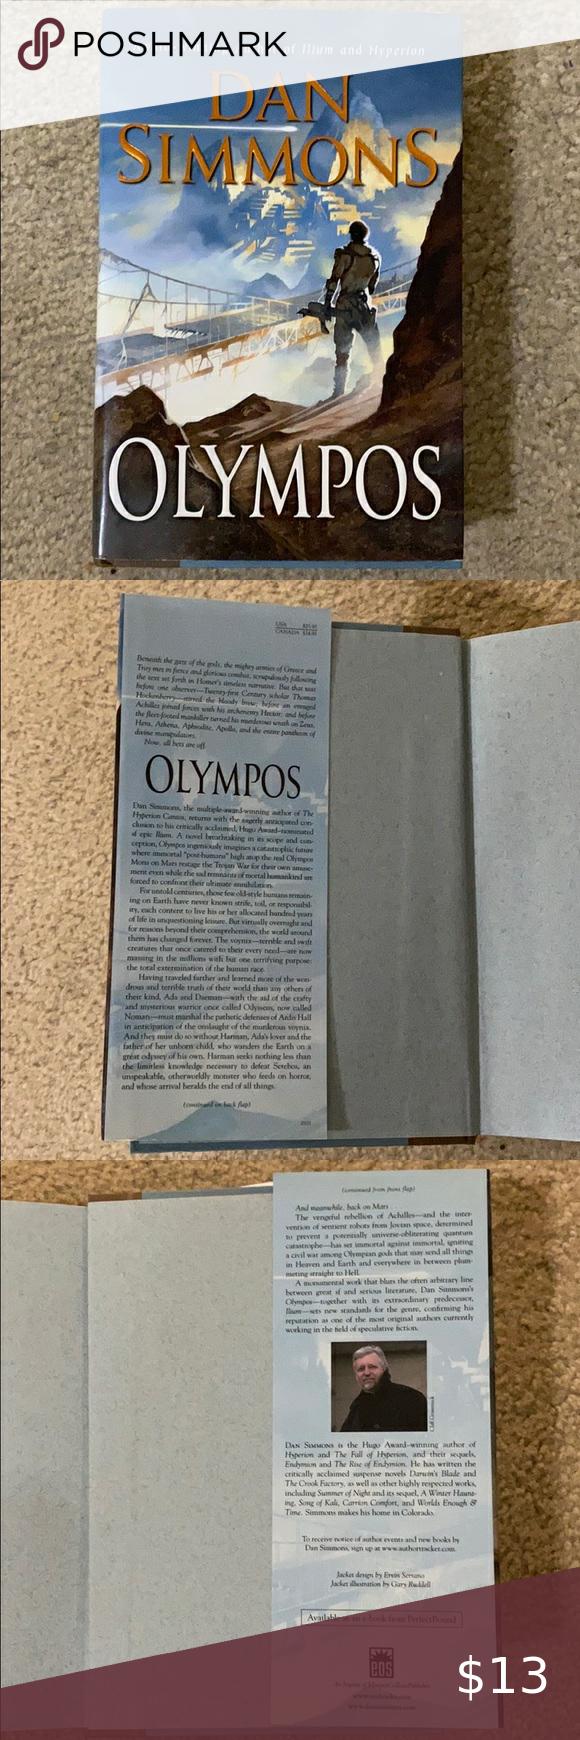 Olympos By Dan Simmons Dan Simmons Simmons Dan